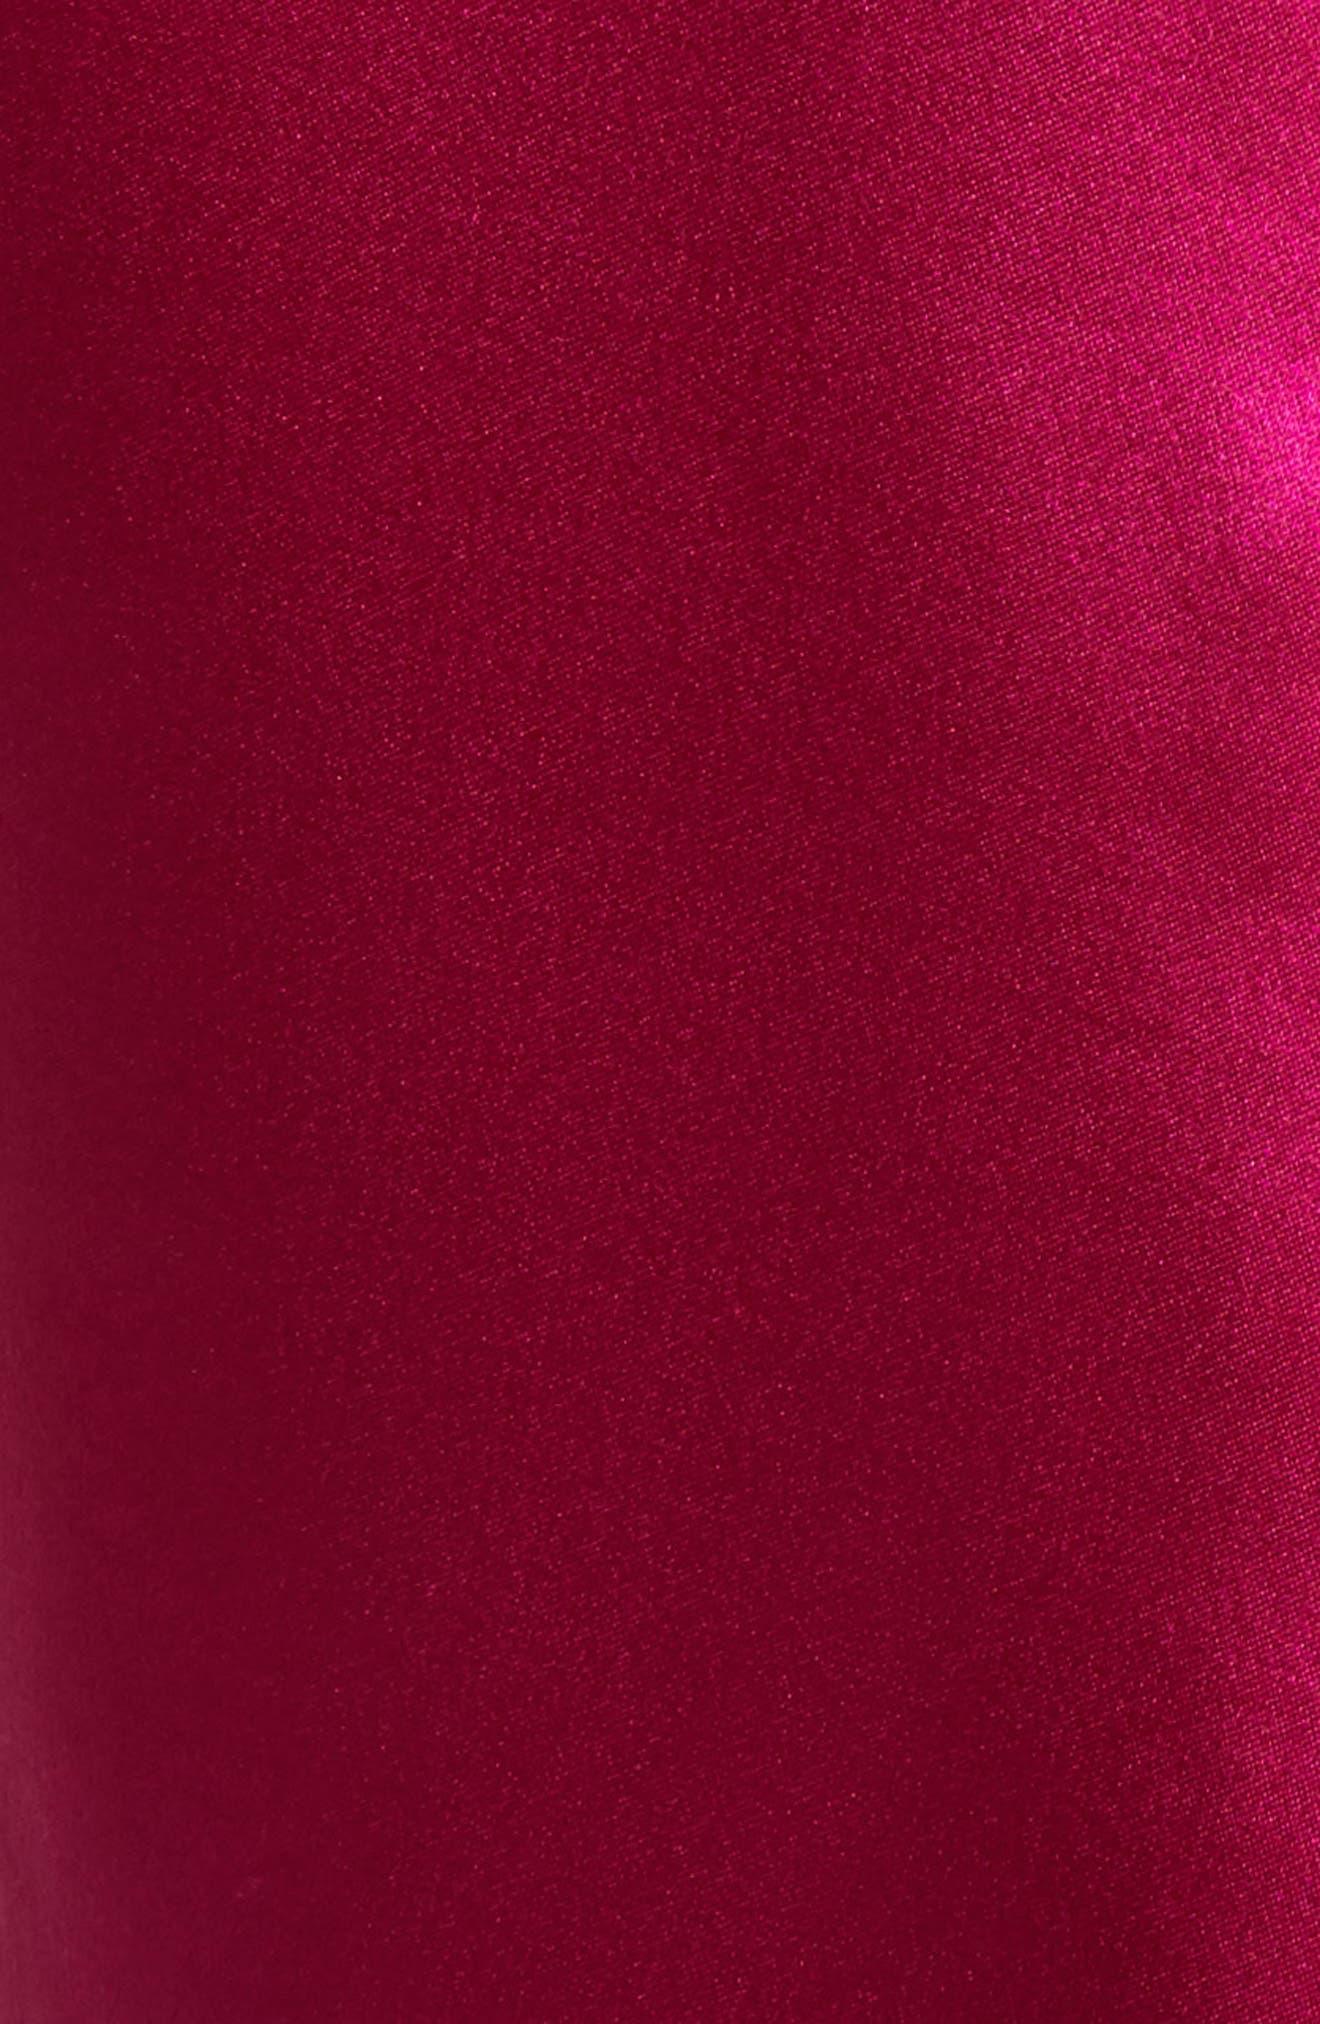 Zipper Detail Lacquered Silk Top,                             Alternate thumbnail 5, color,                             655